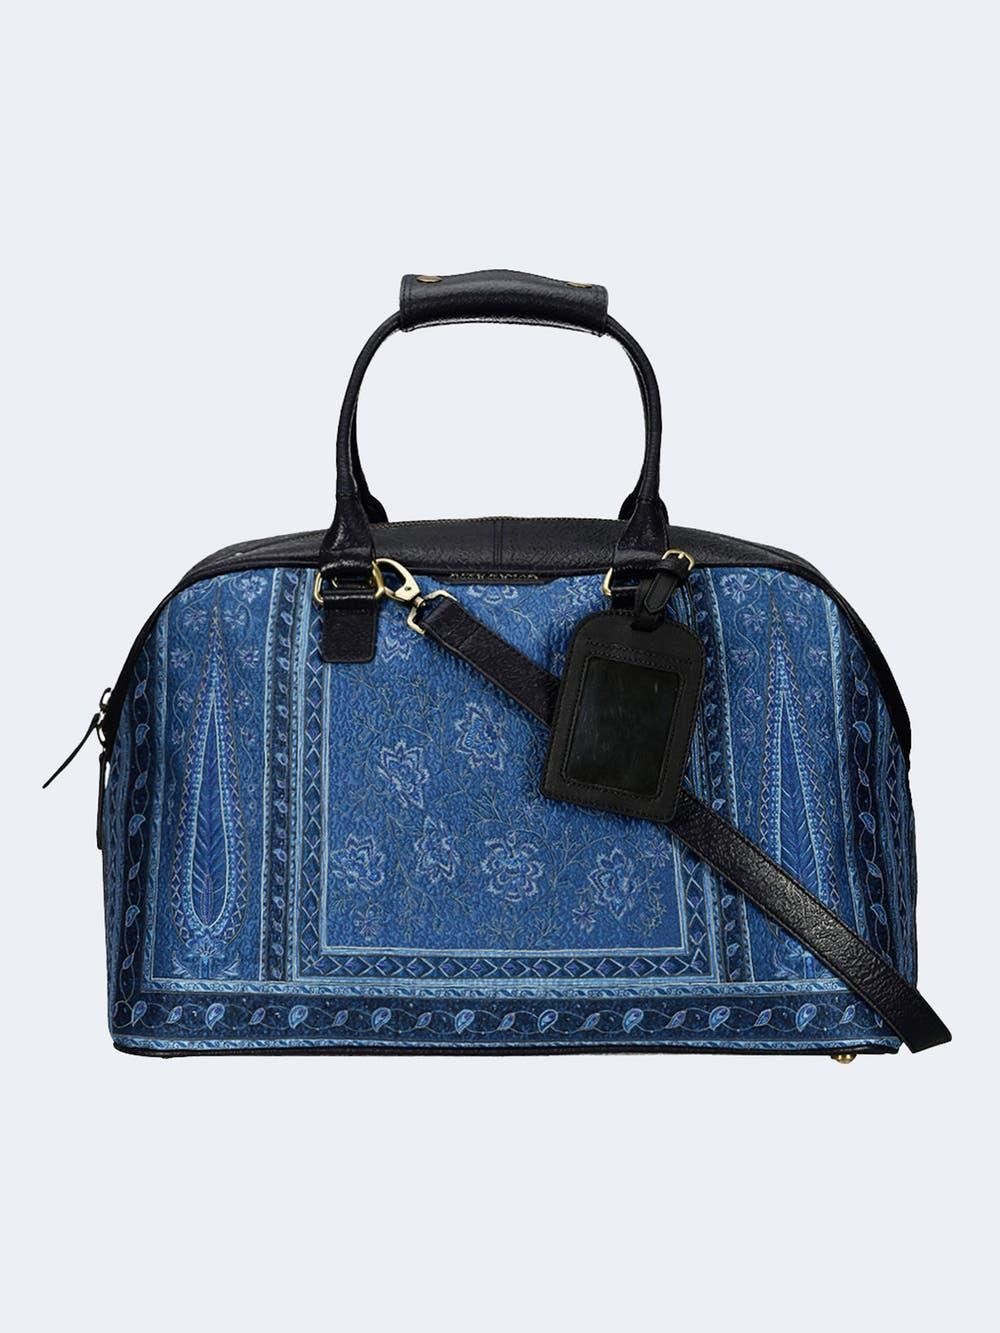 Indigo & Black Embossed Luggage Bag